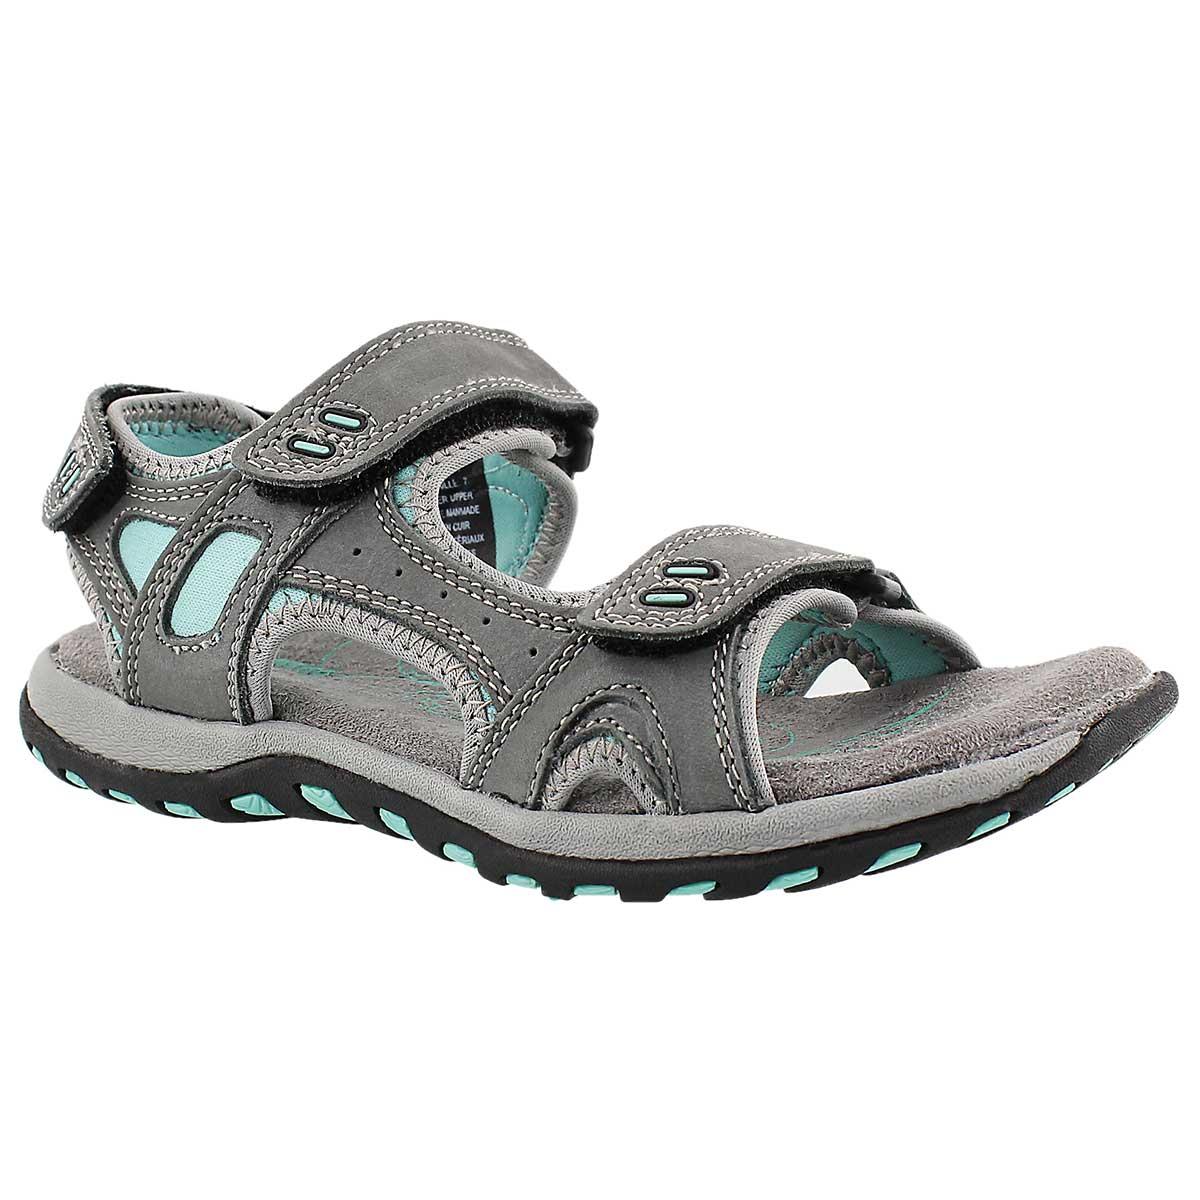 Sandale sport CLARA 2, gris, femmes